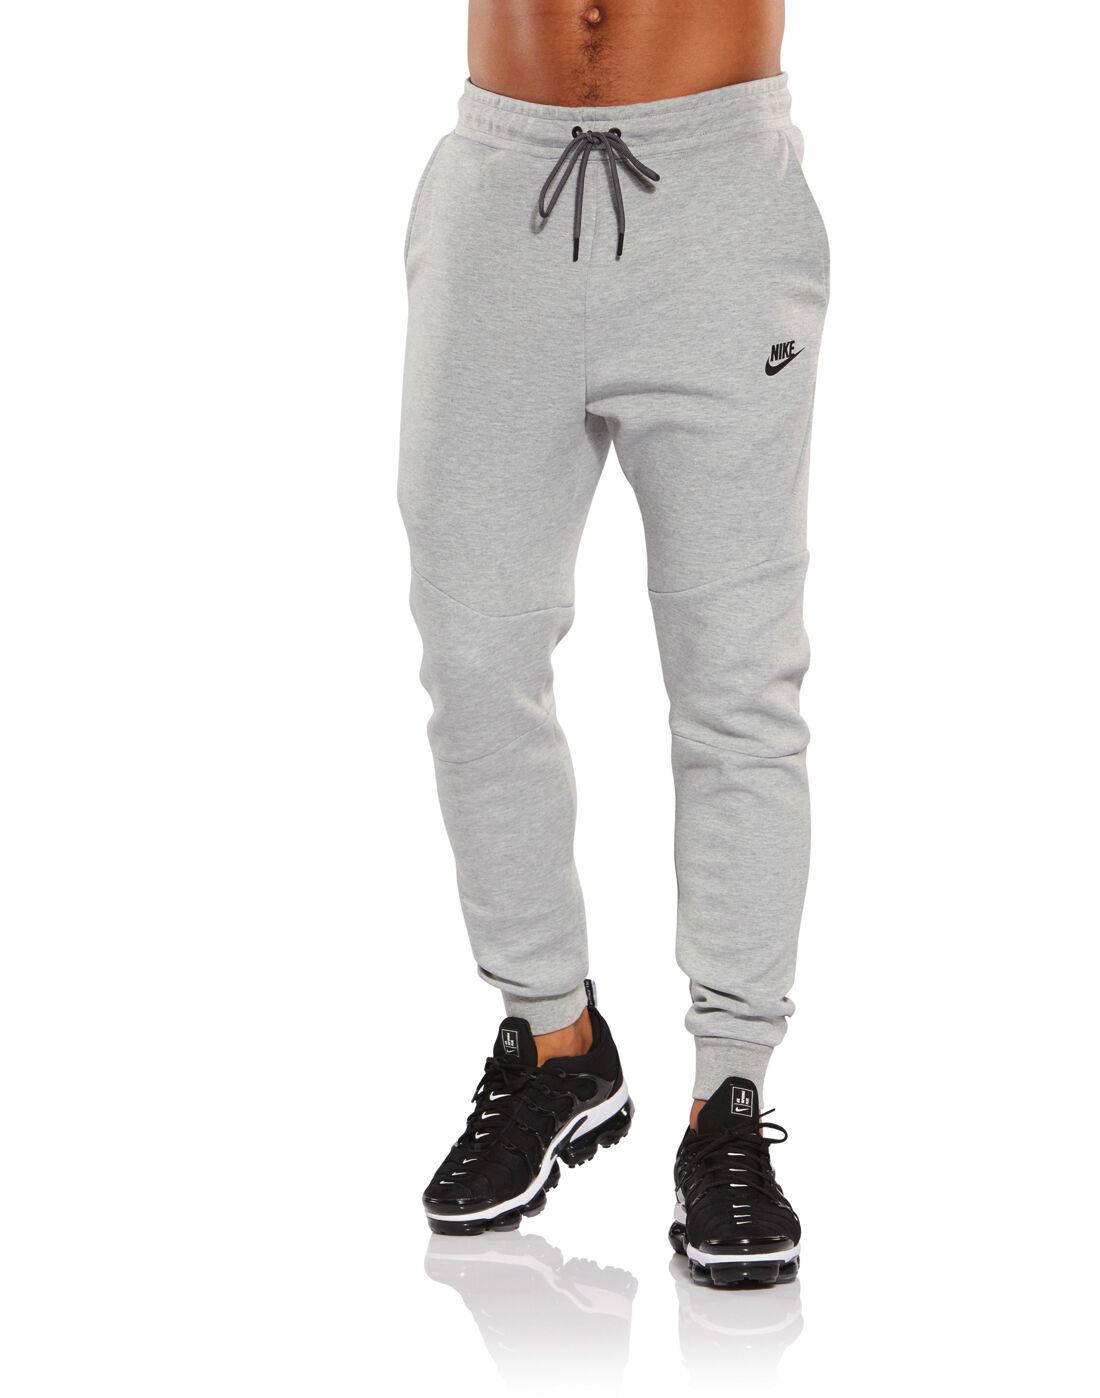 Nike Mens Tech Fleece Joggers - Grey